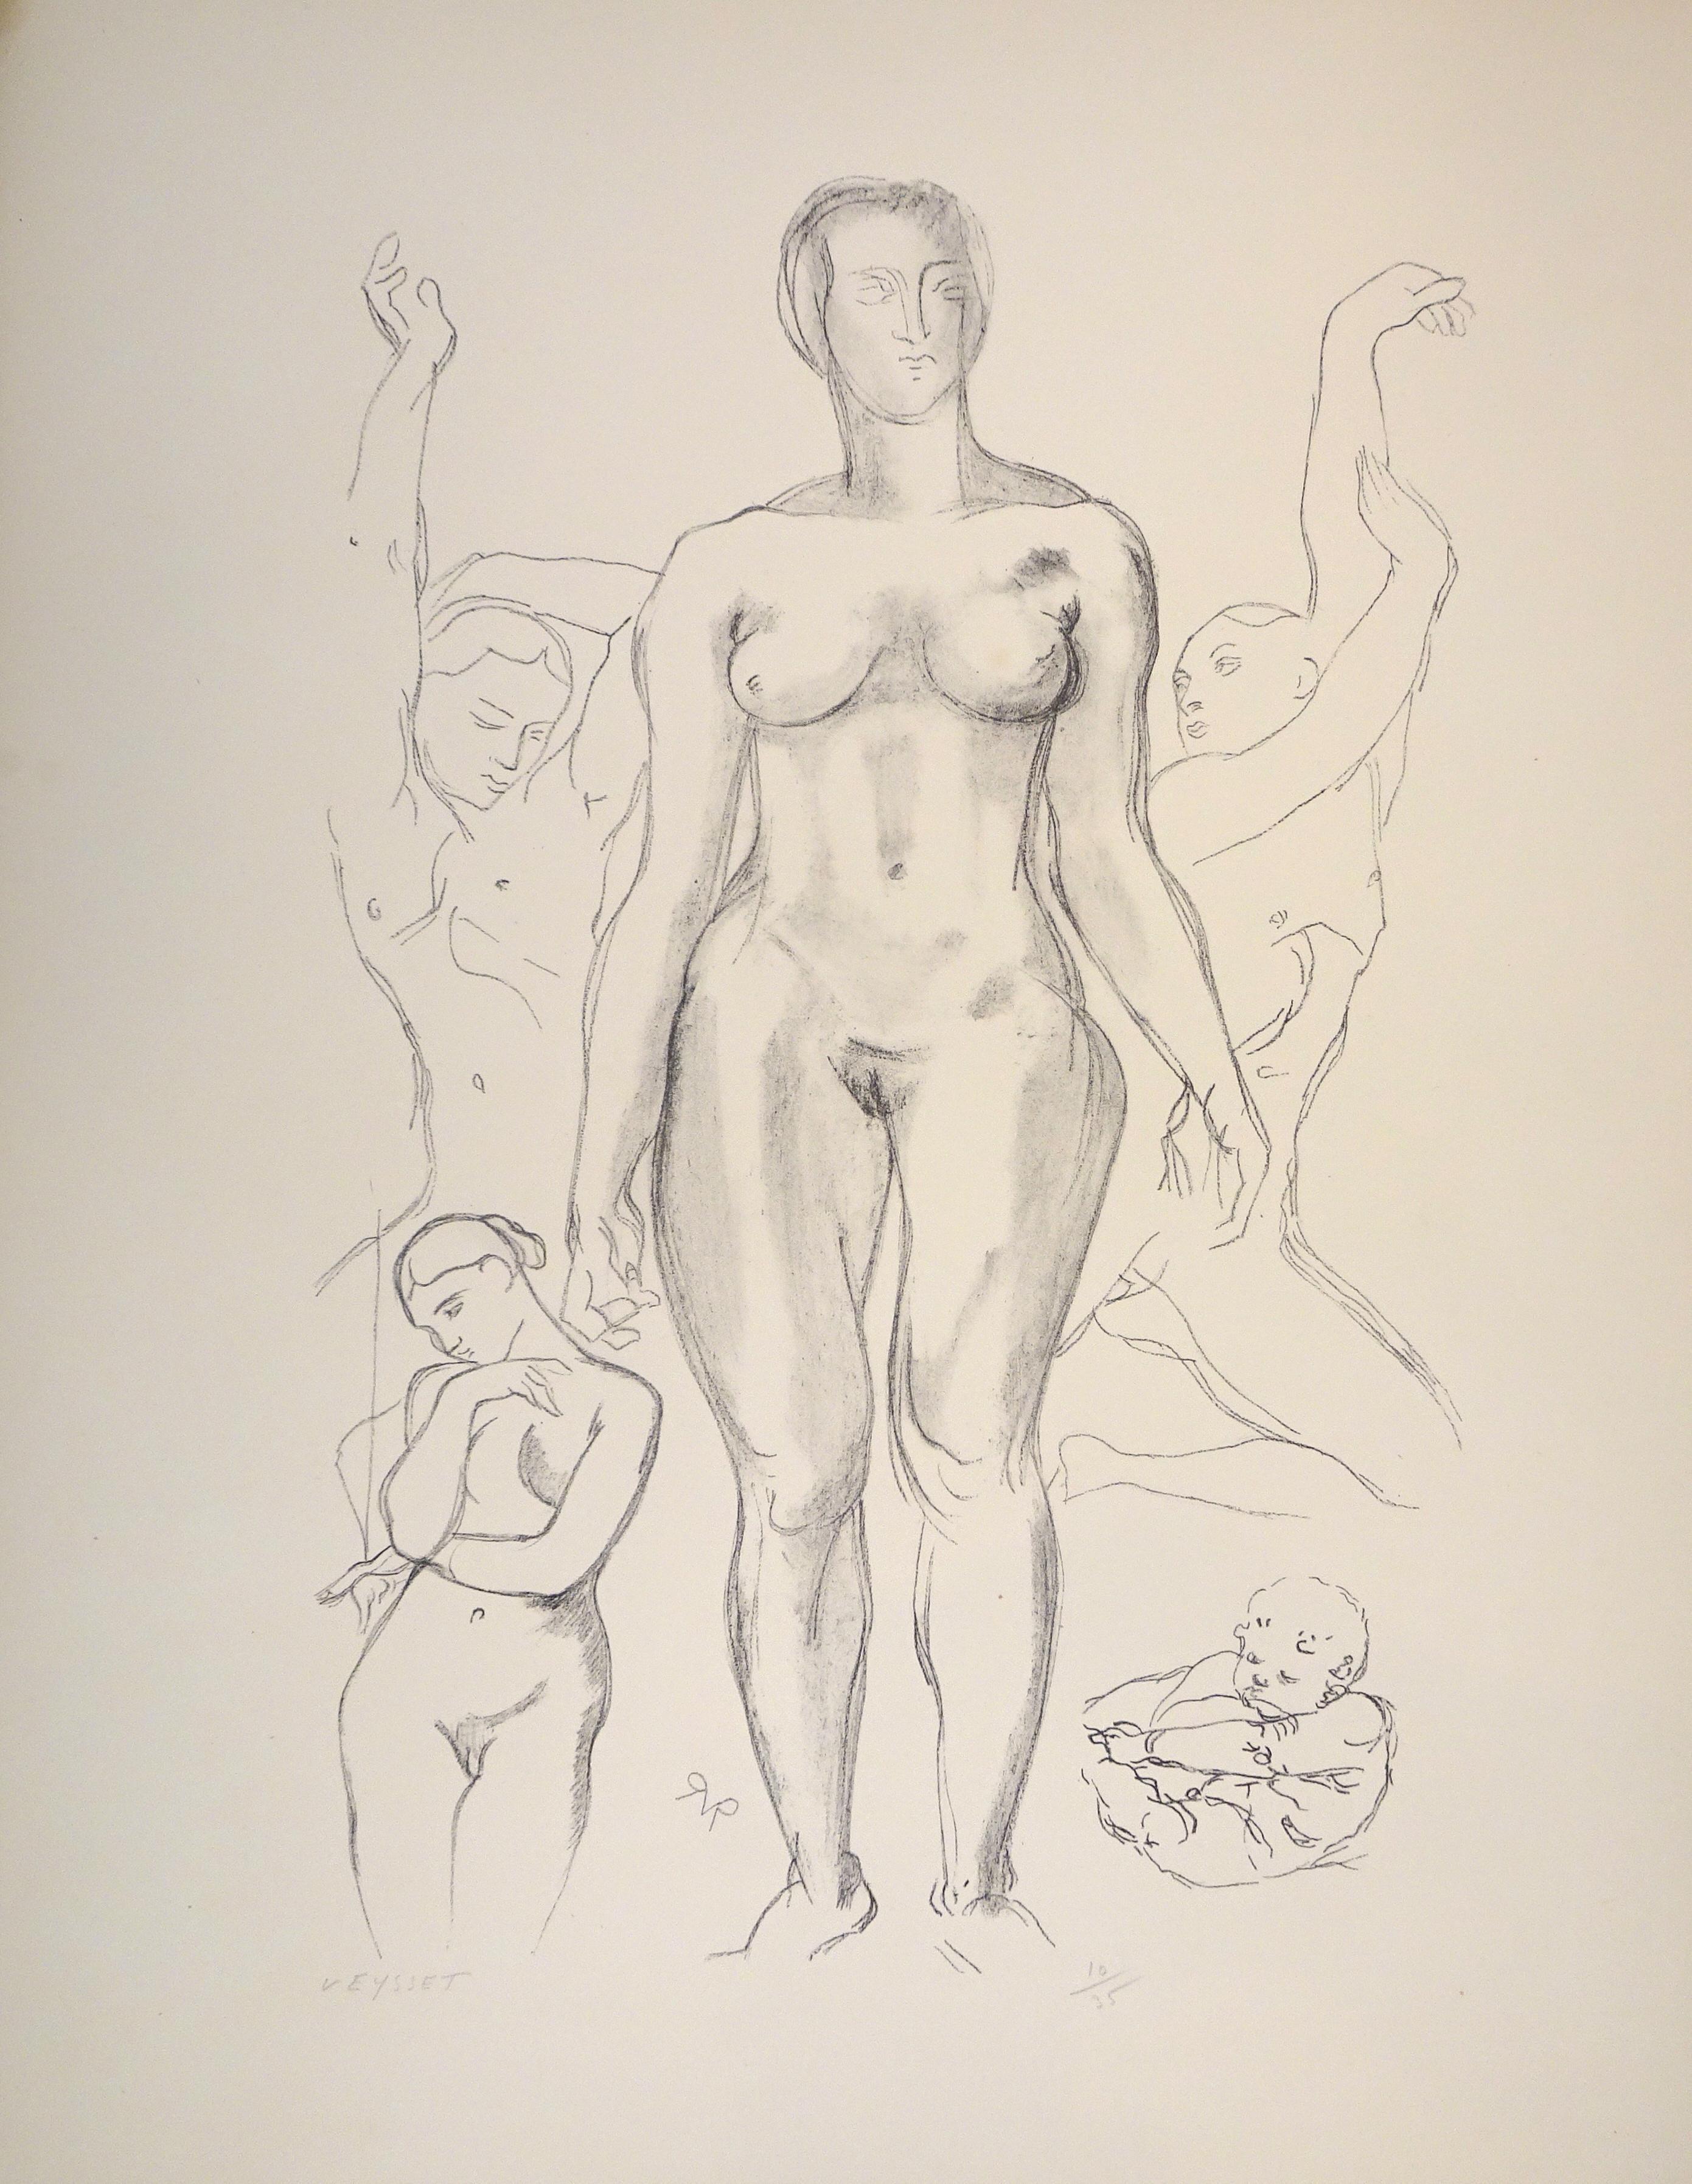 Standing Female Nude - Original Lithograph by Raymond Veysset